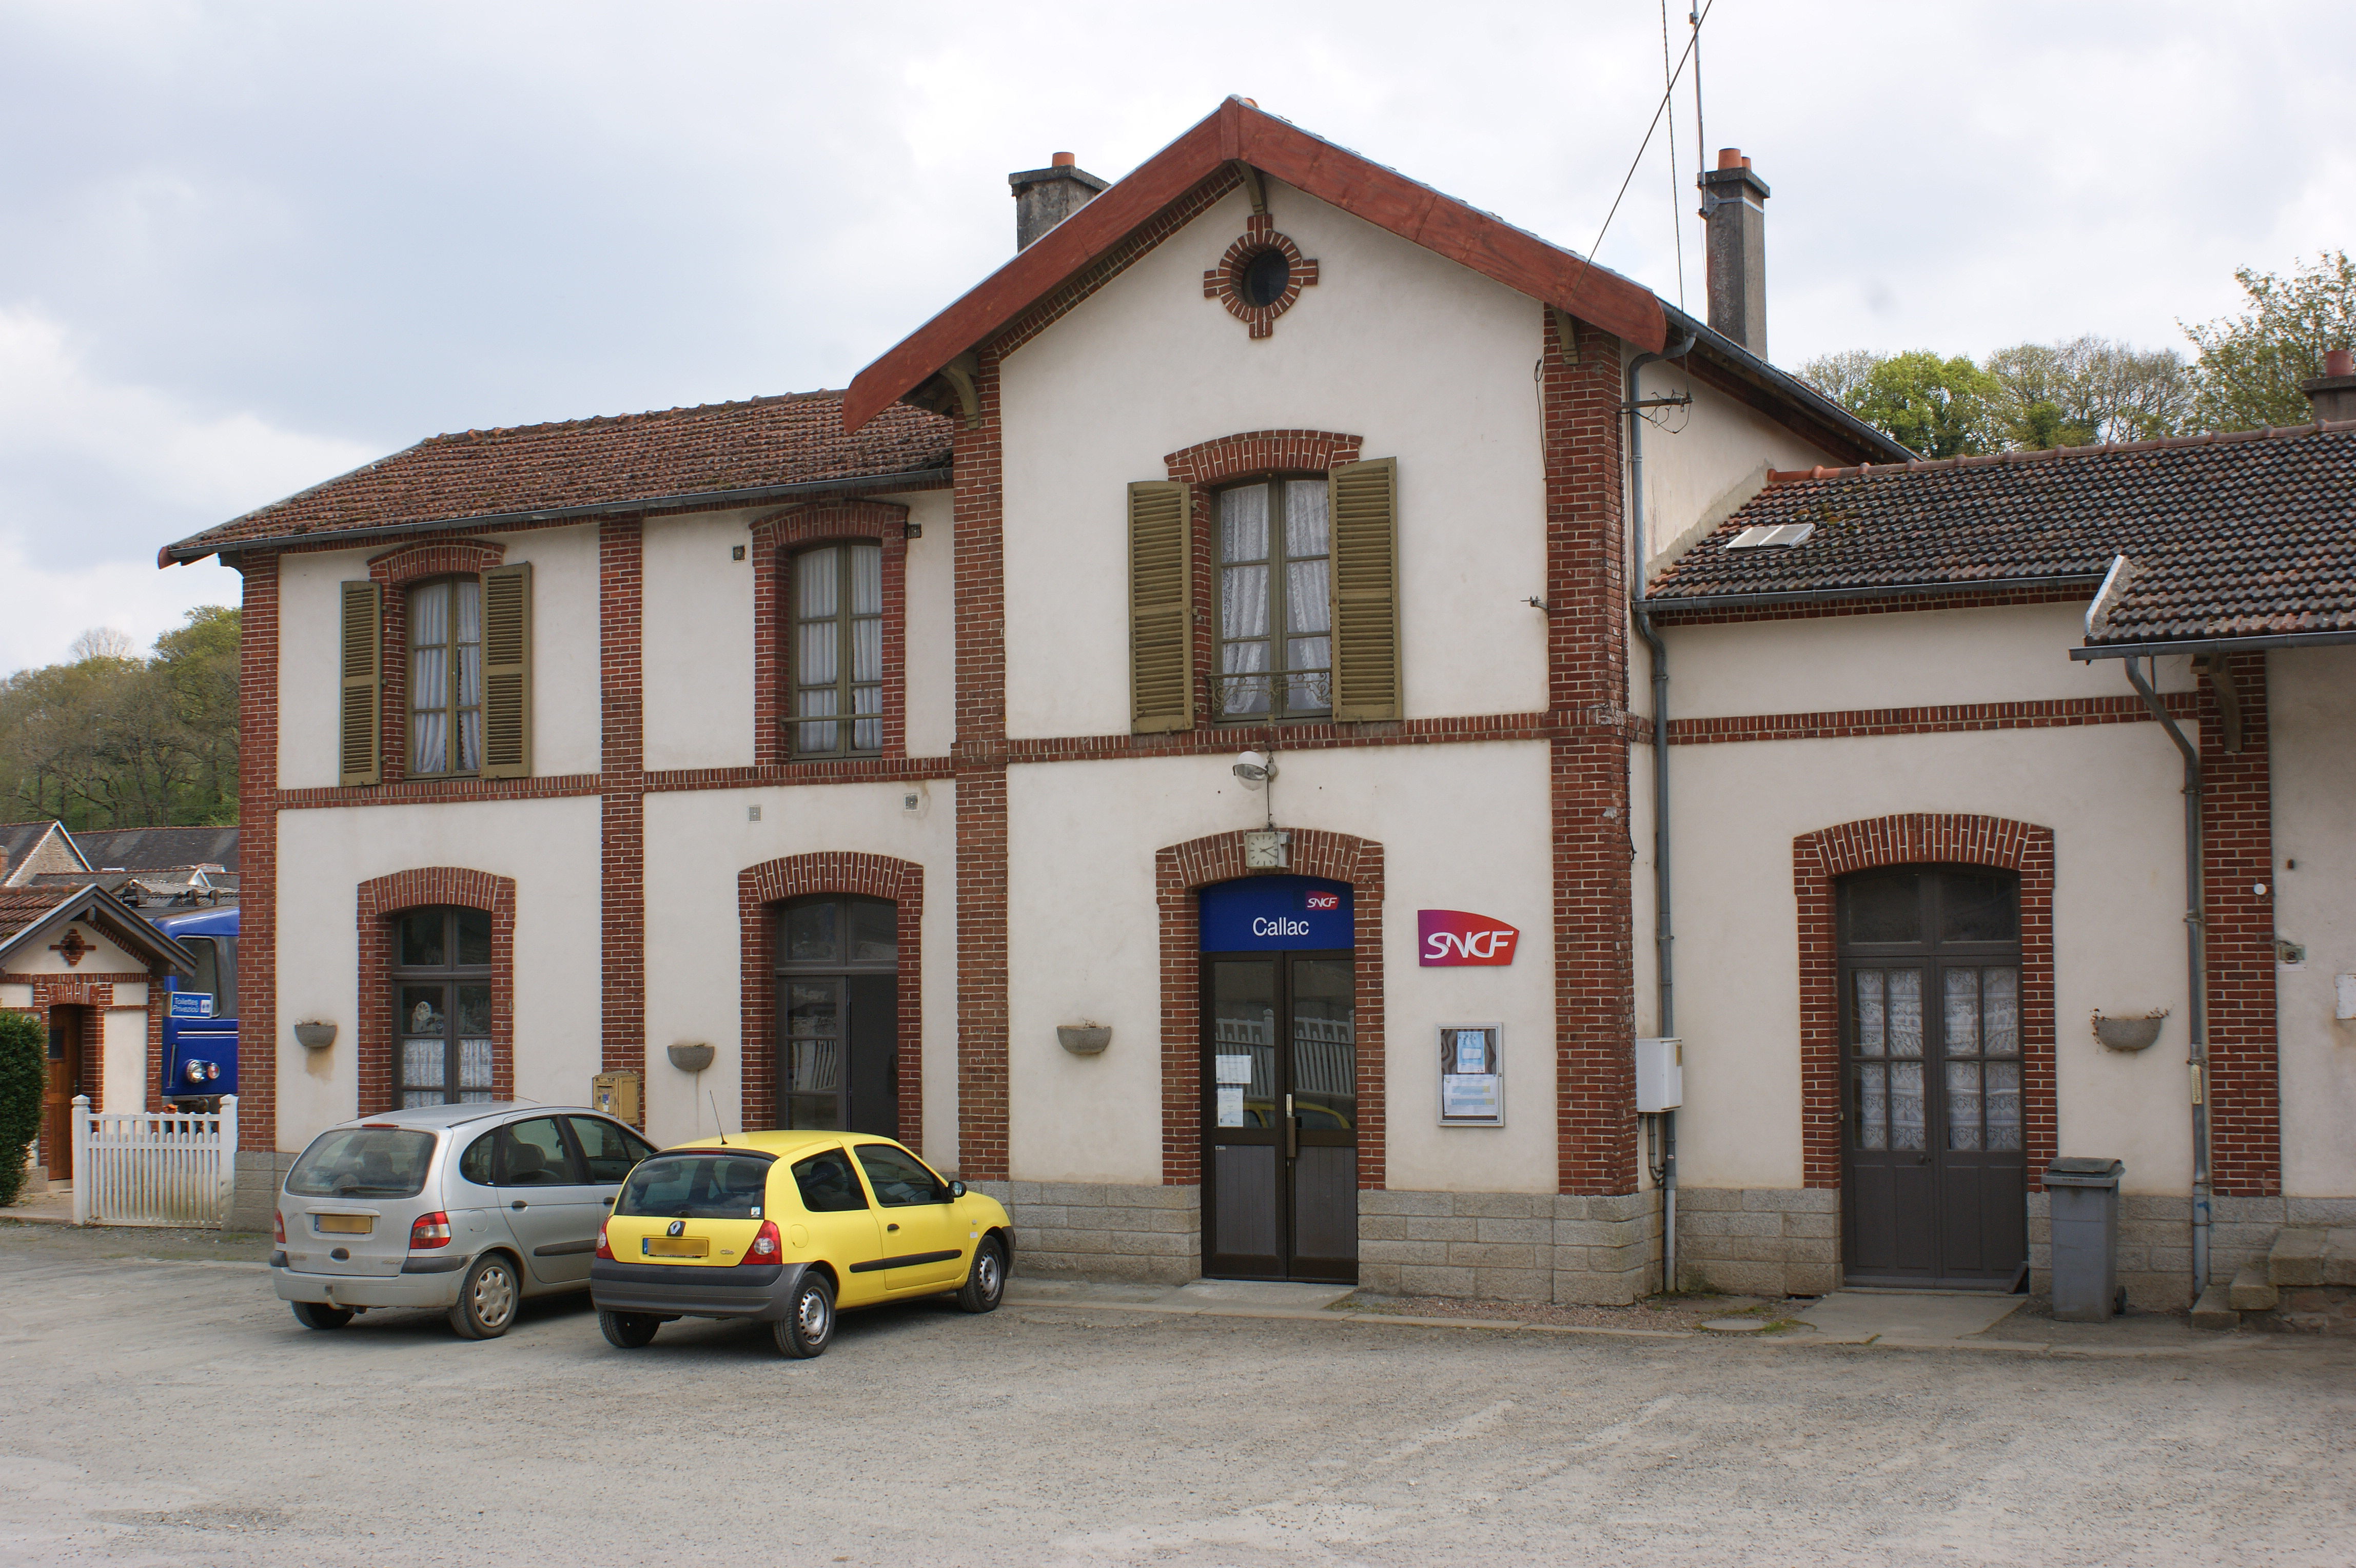 Station Callac